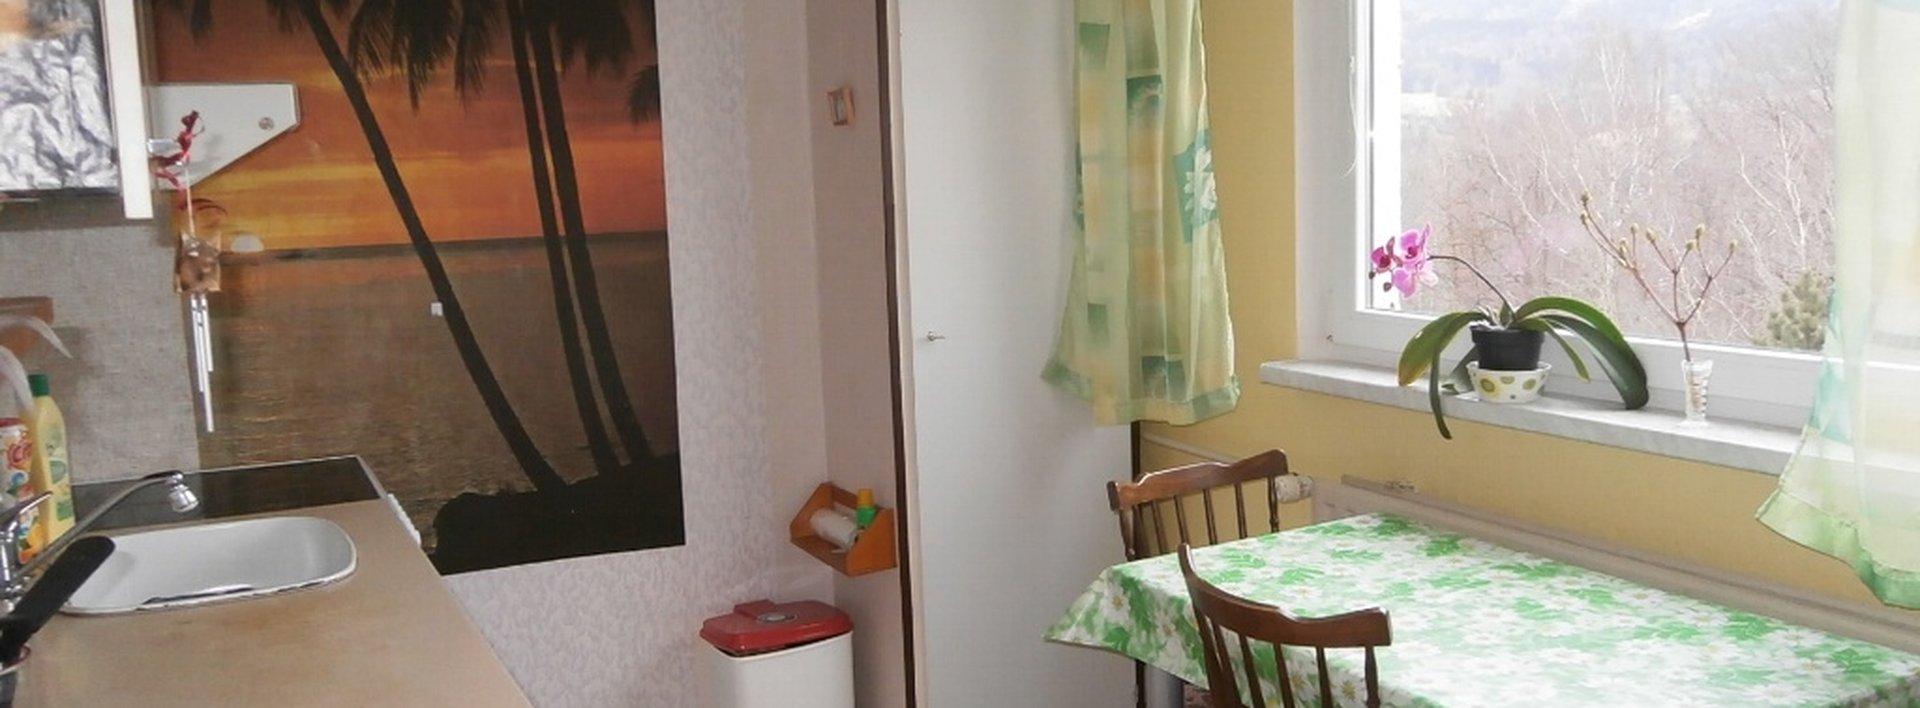 Prodej slunného bytu 2+1 s krásnými výhledy v Liberci, Ev.č.: N46600